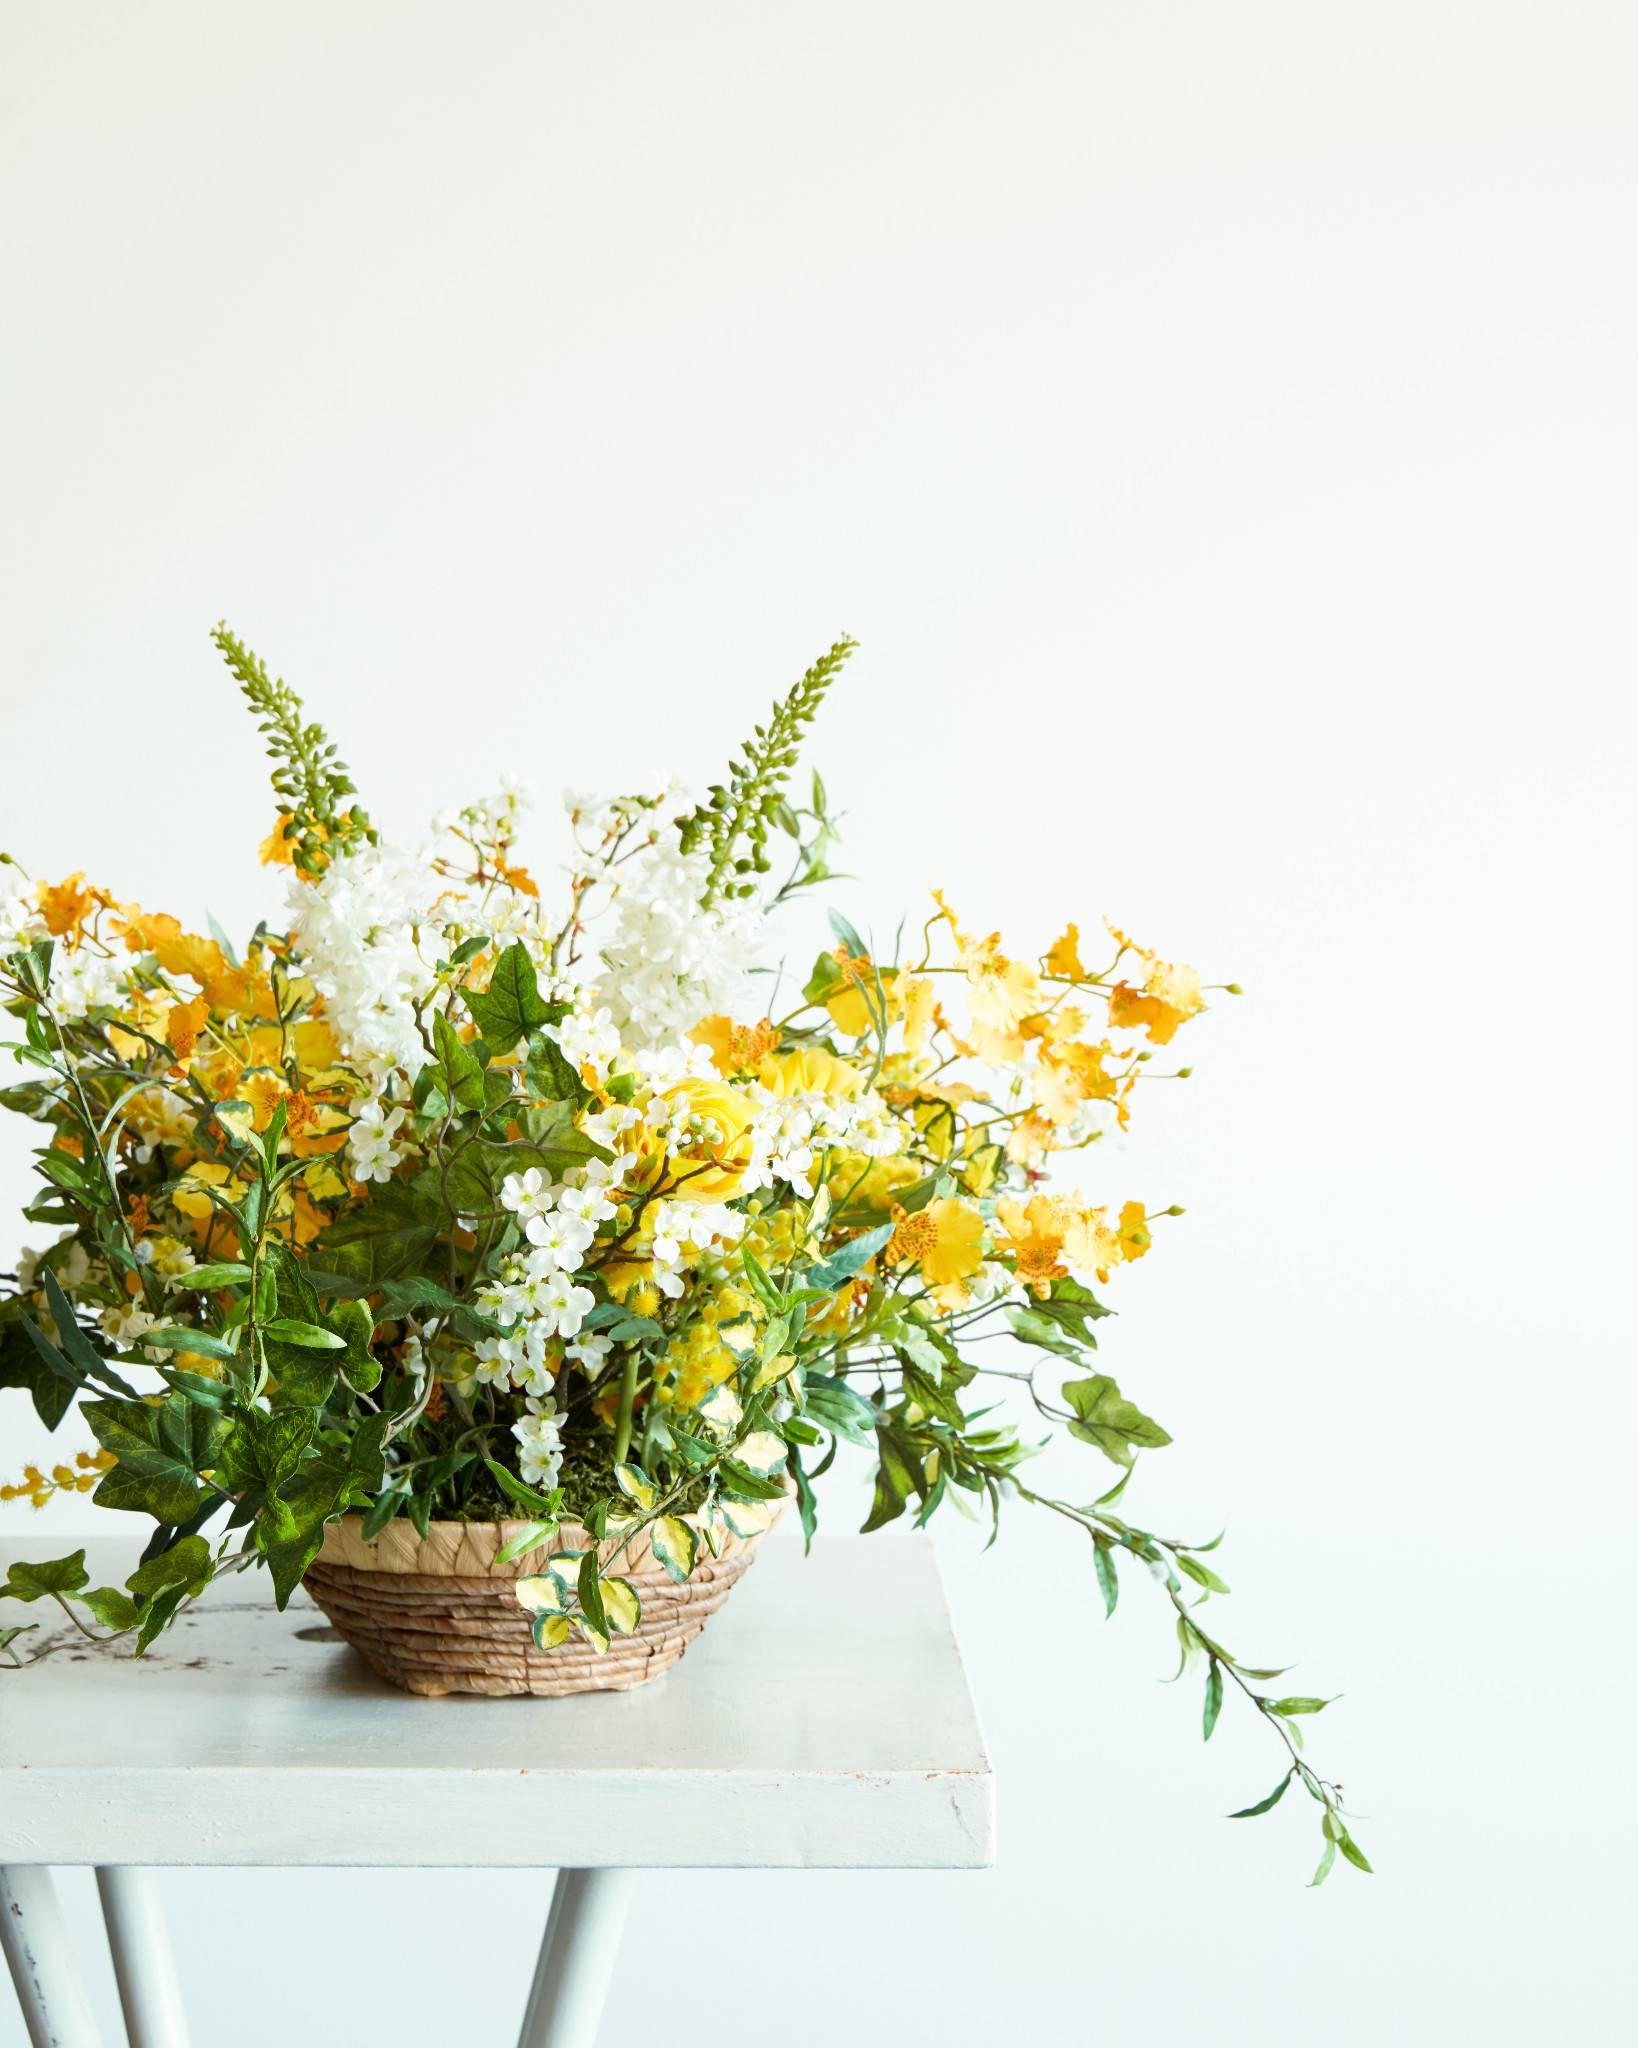 Flower Arrangement In Basket Balsam Hill